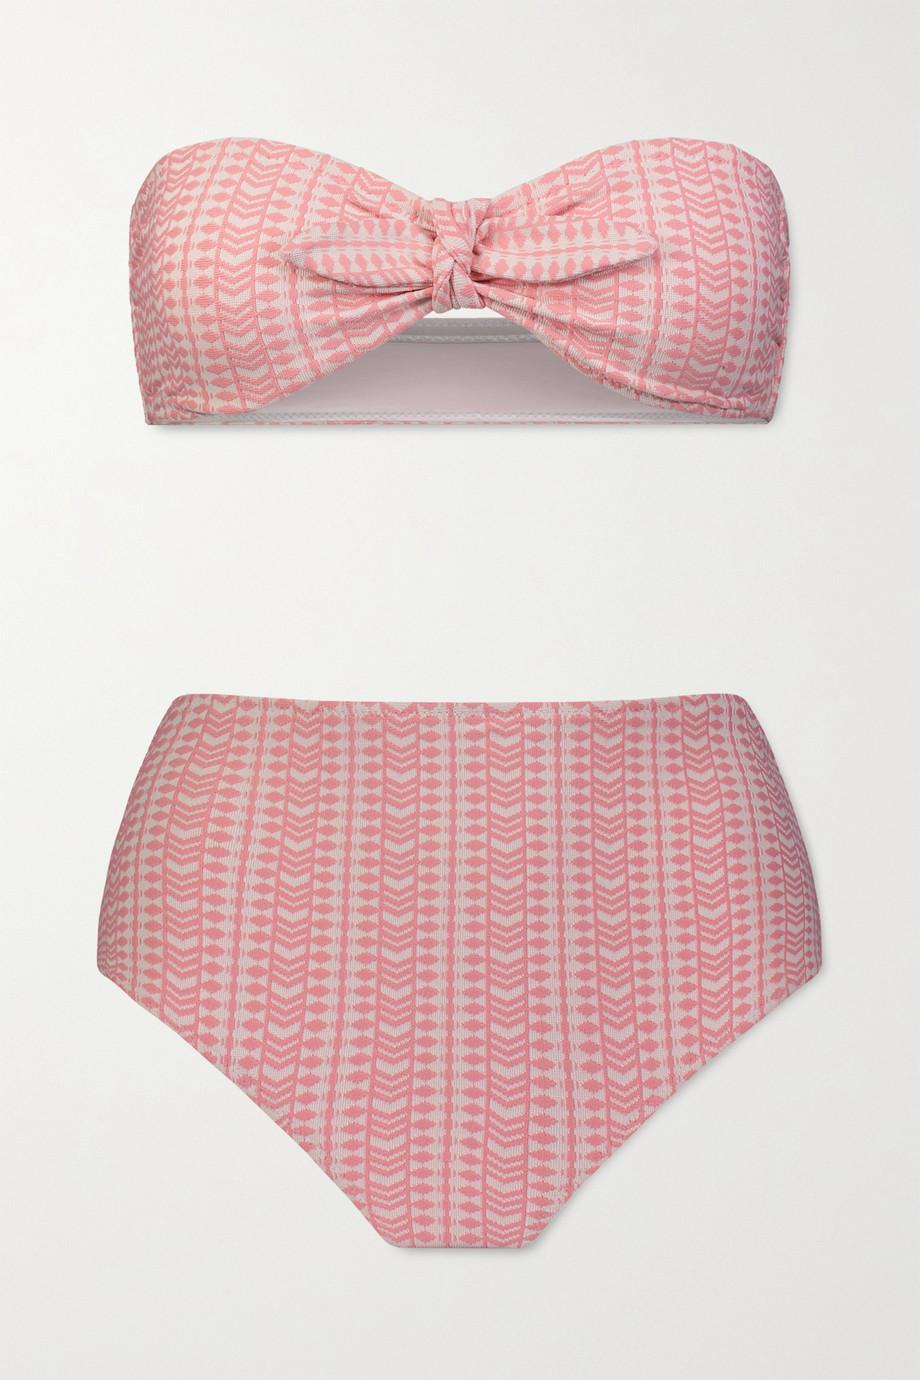 LemLem Lola Bandeau-Bikini aus Stretch-Jacquard